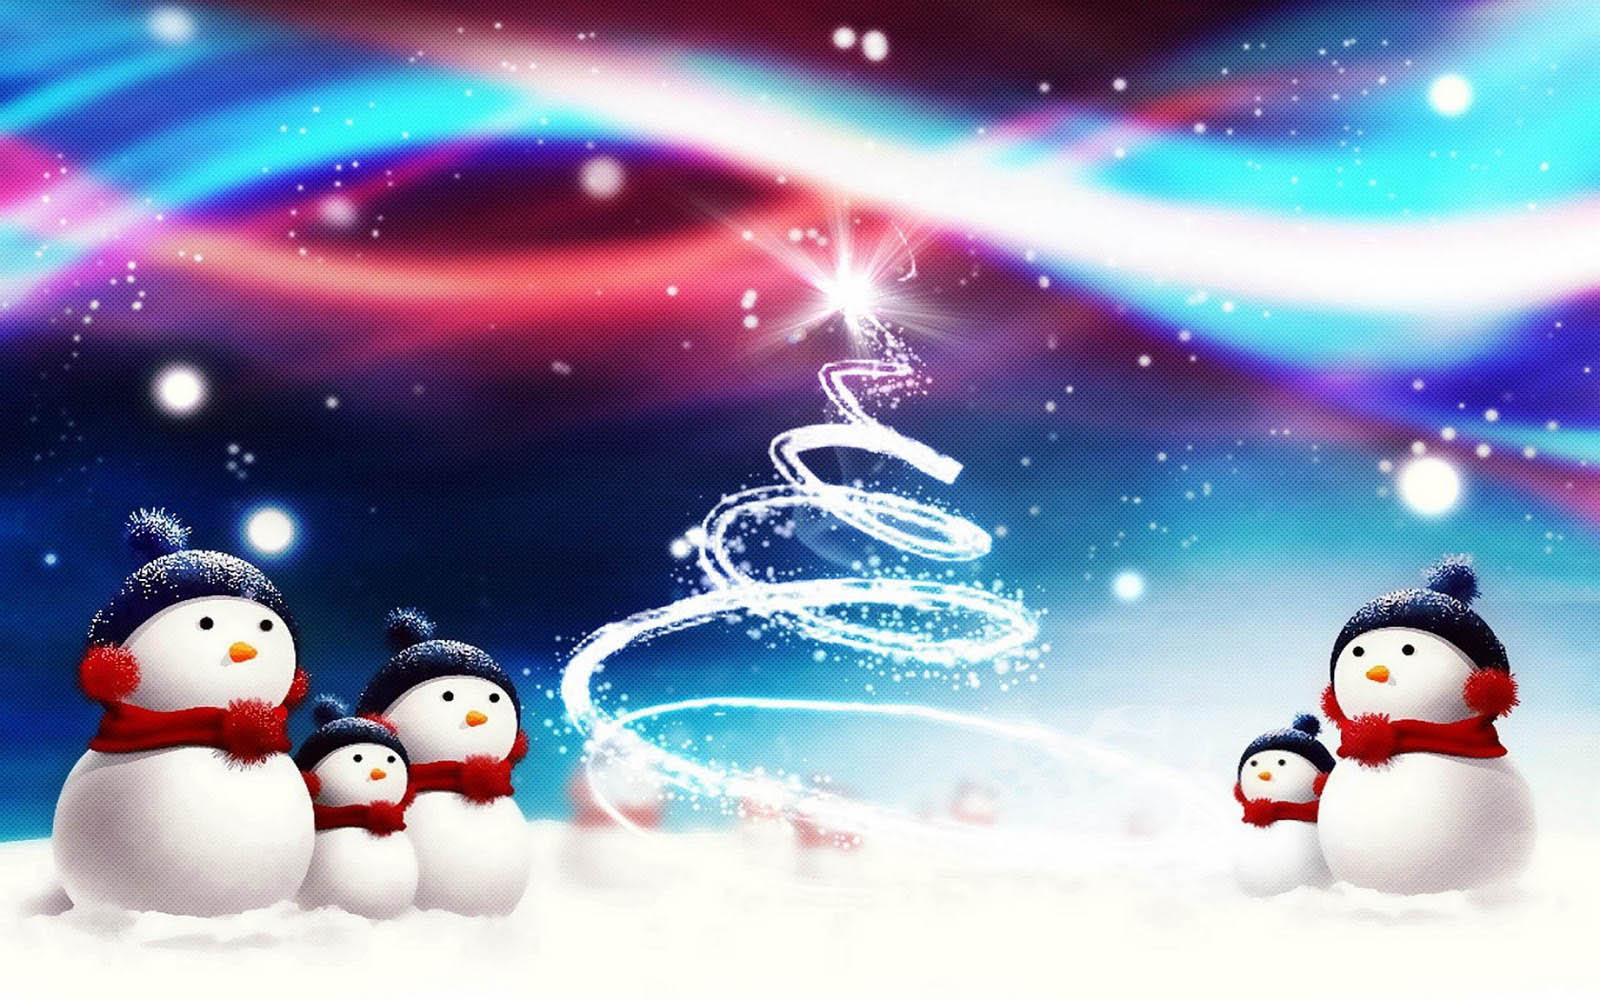 75 Snowman Desktop Backgrounds On Wallpapersafari